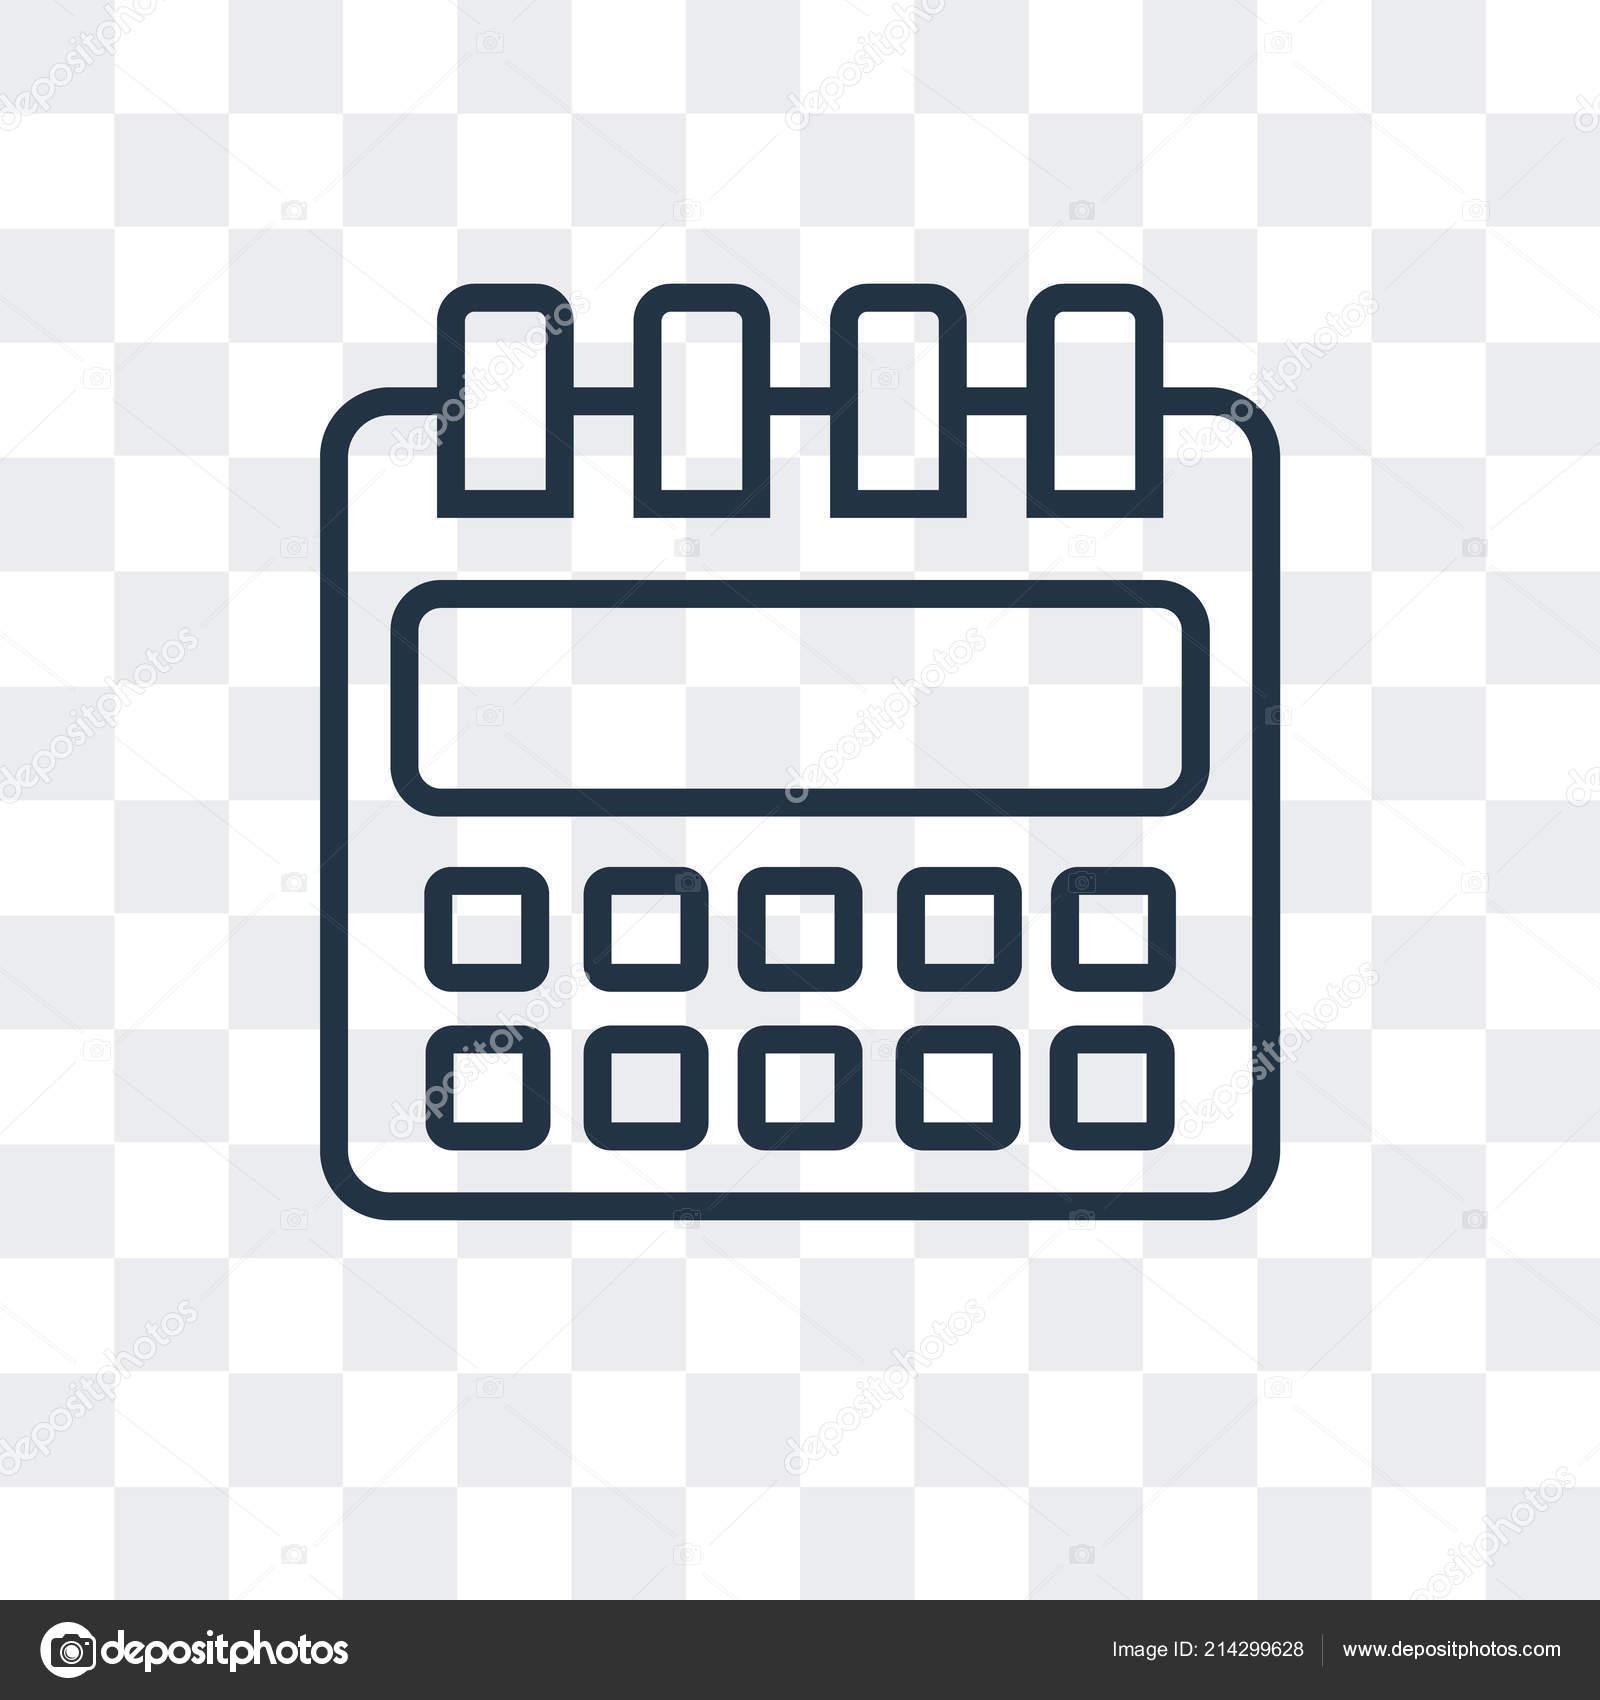 Calendrier Icone Png.Icone Calendrier Vecteur Isole Sur Fond Transparent